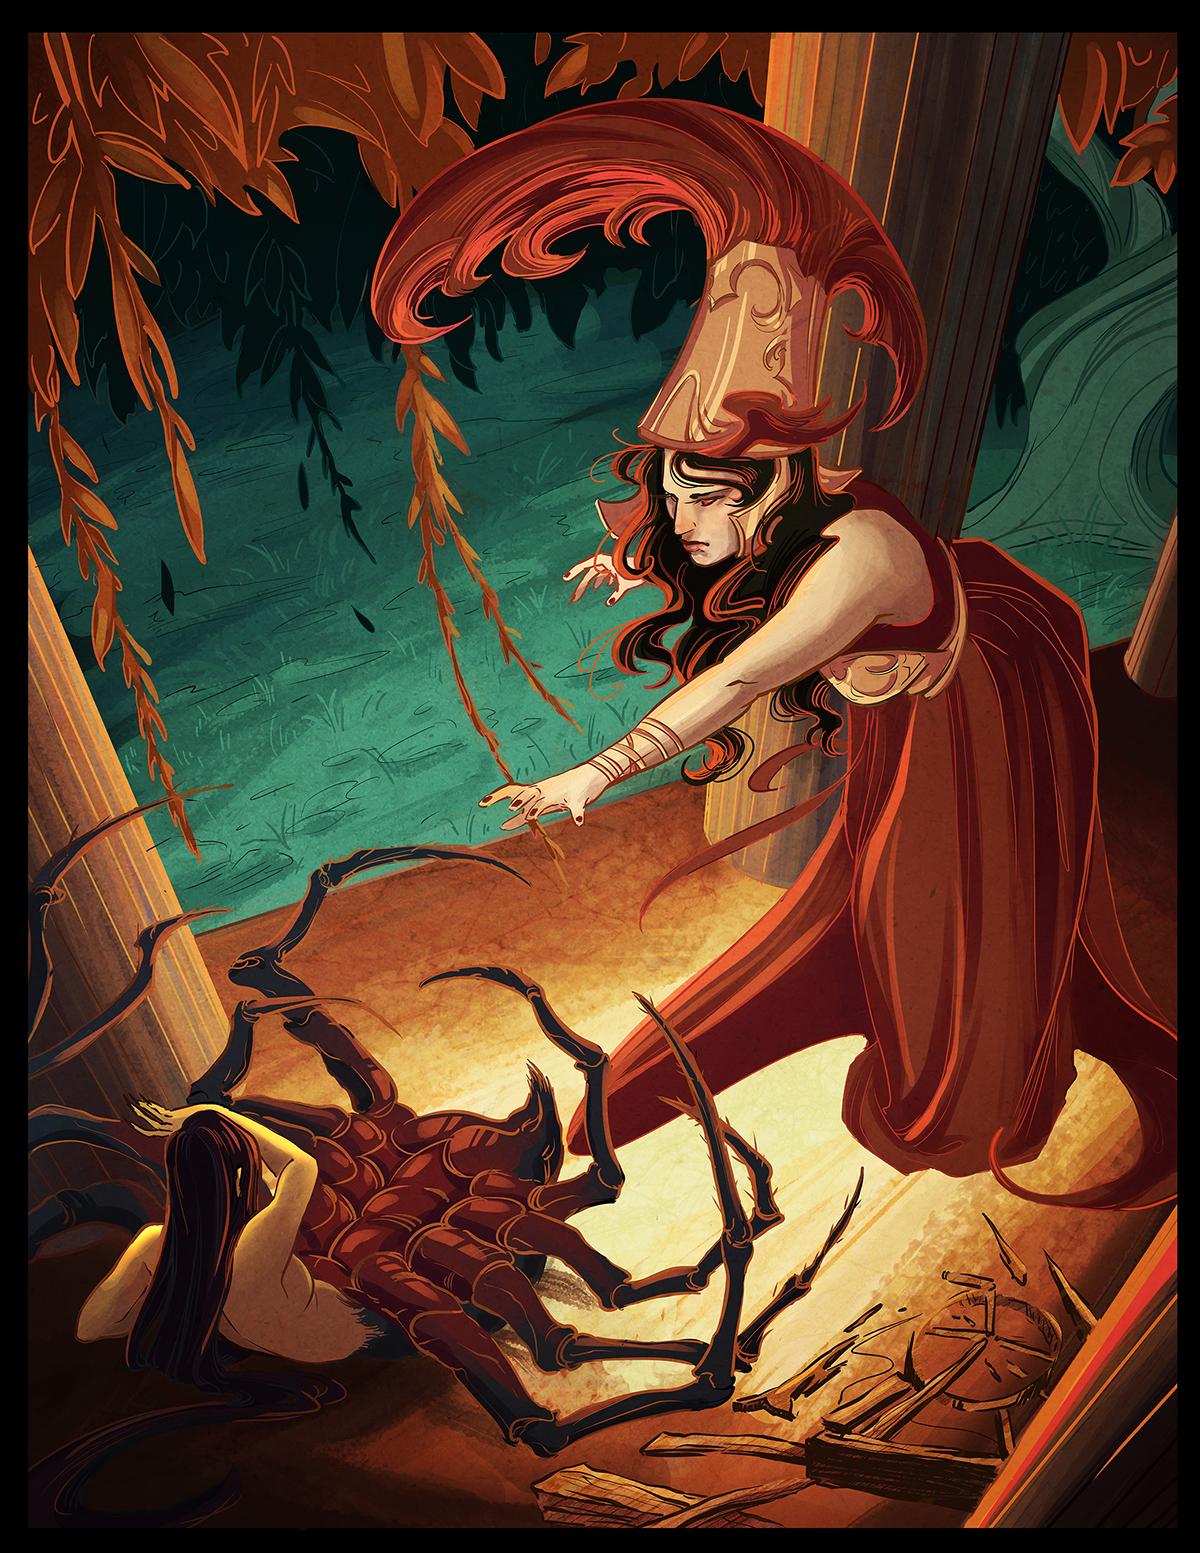 Athena and Arachne on Behance